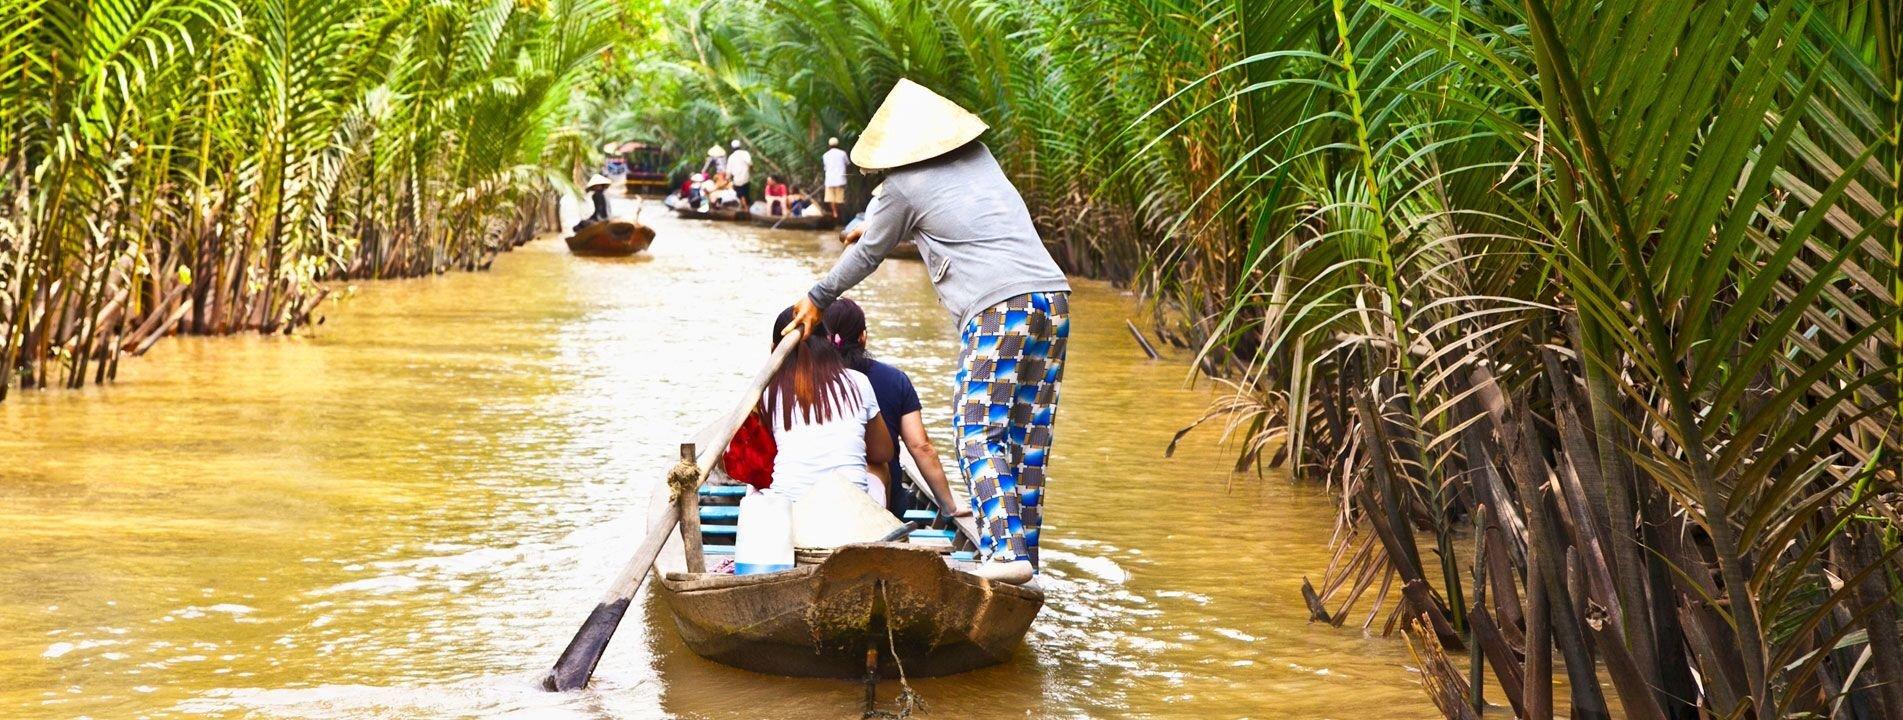 Local Vietnam Woman